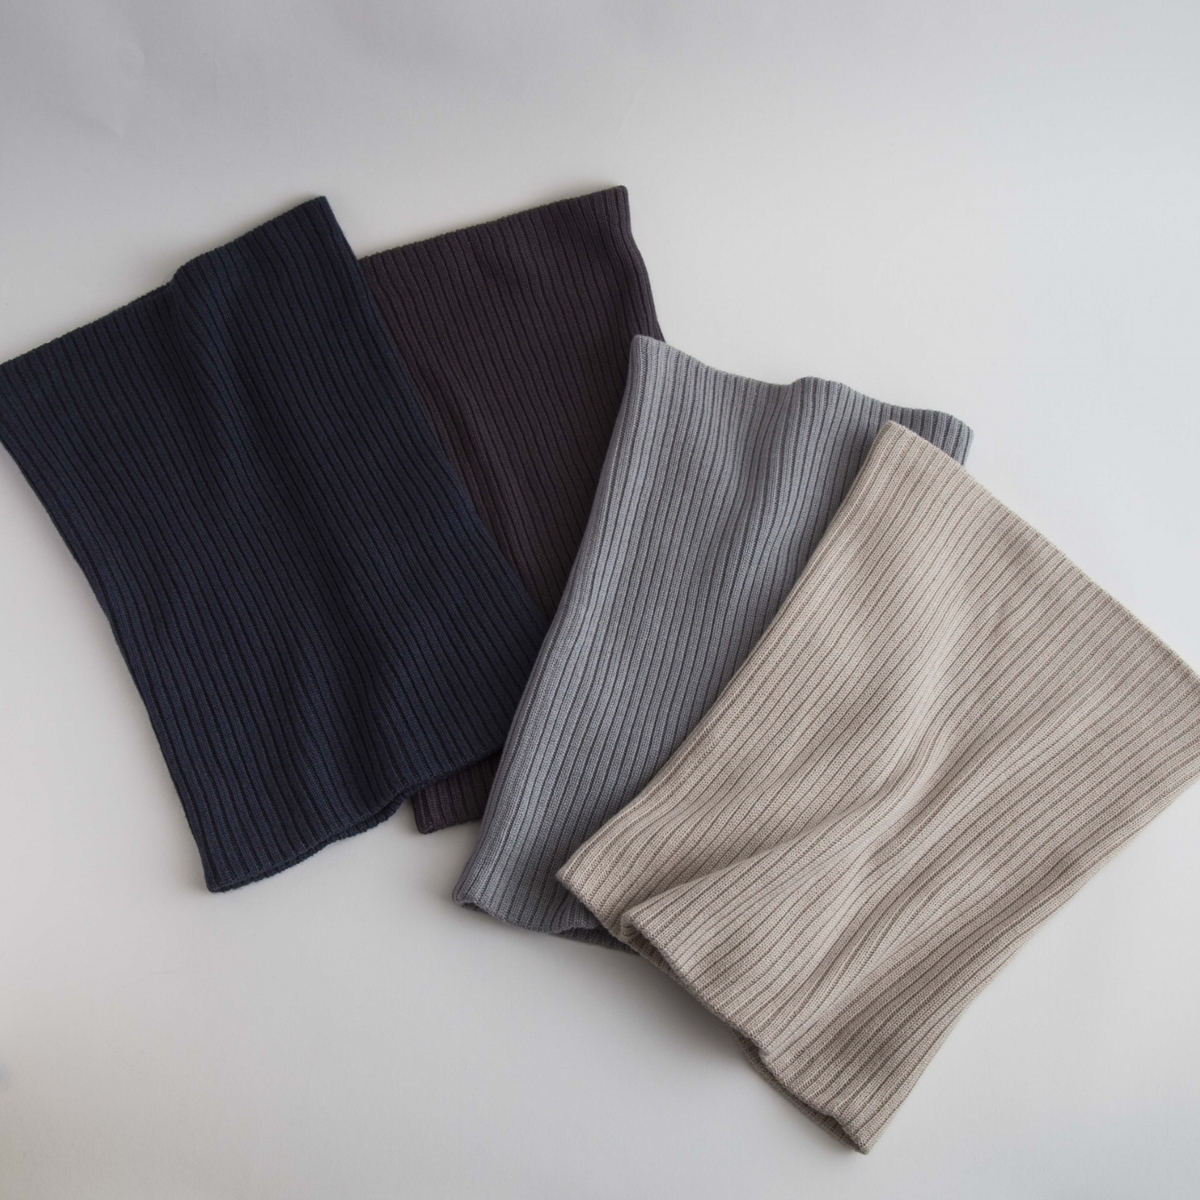 DRESS HERSELF/シルクカシミヤネックウォーマーのカラー